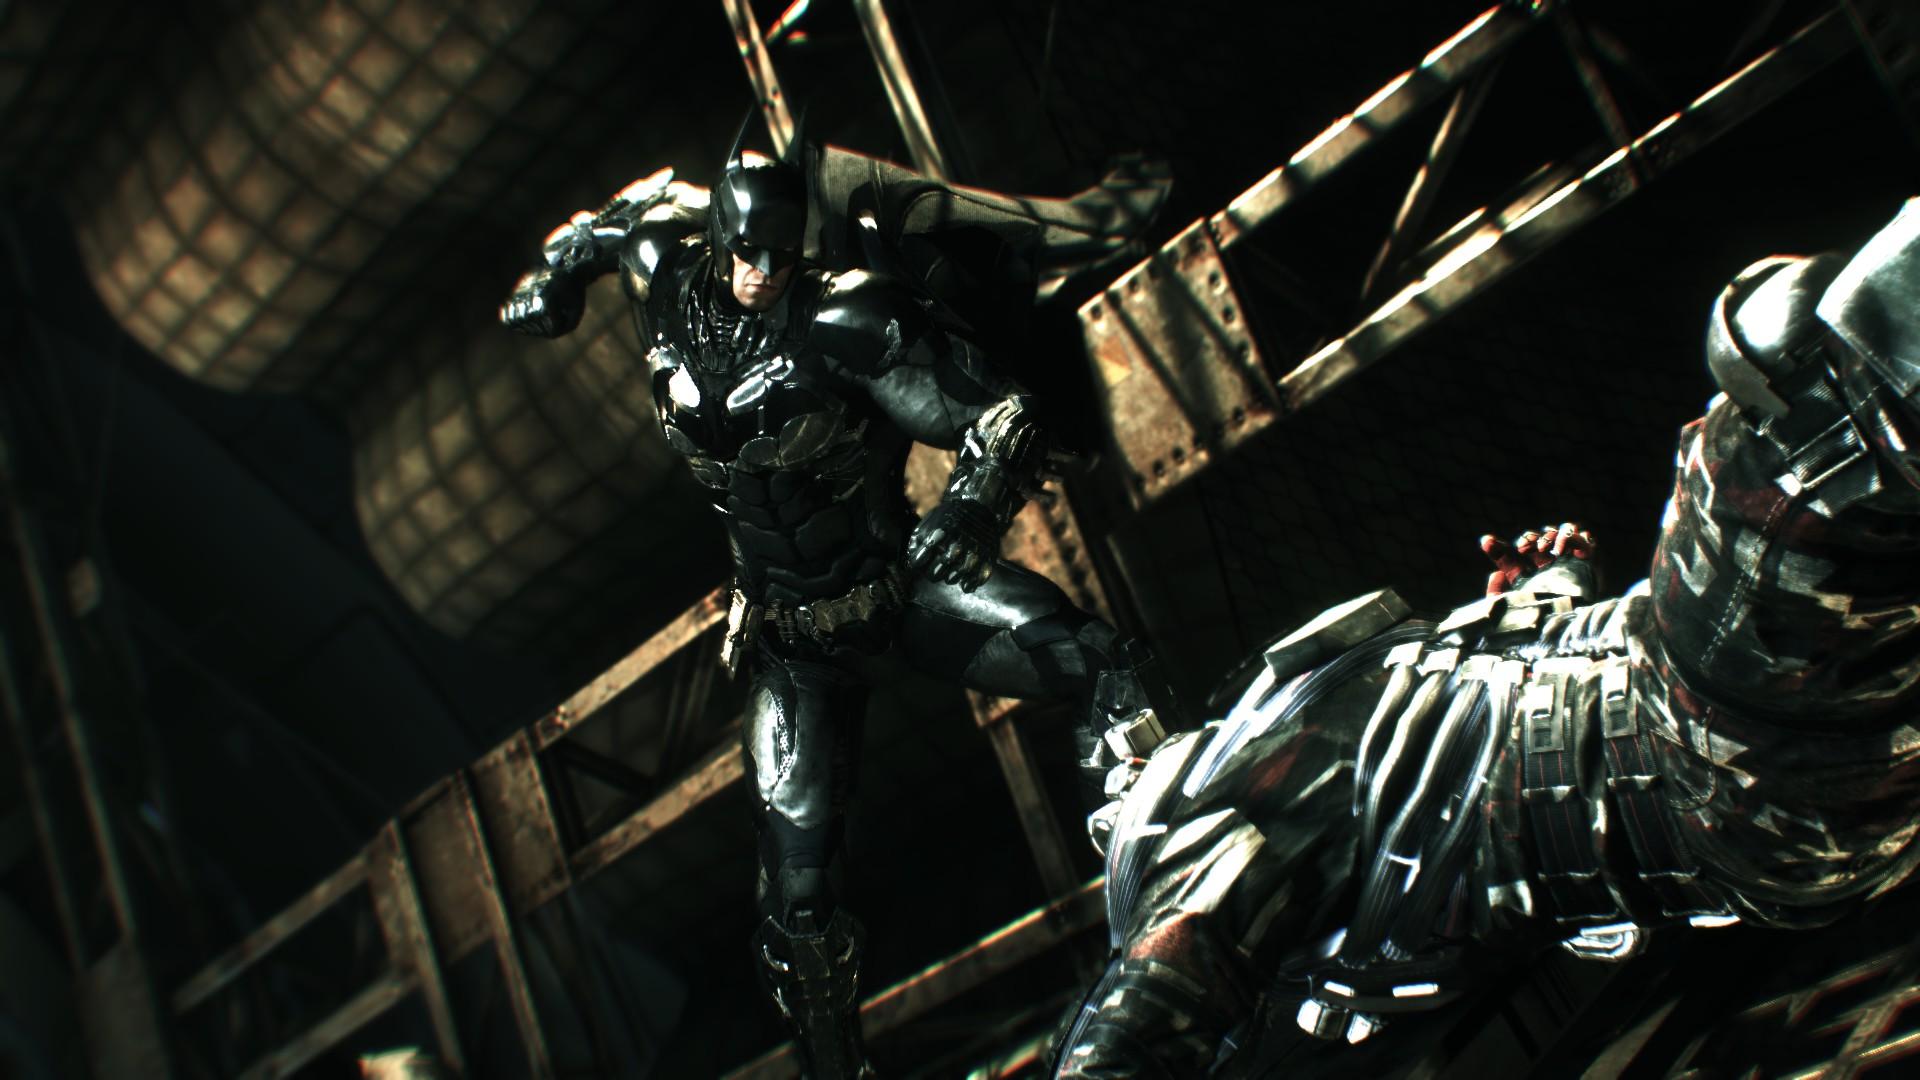 Batman: Arkham Knight - Stojí Season Pass za to? 11122